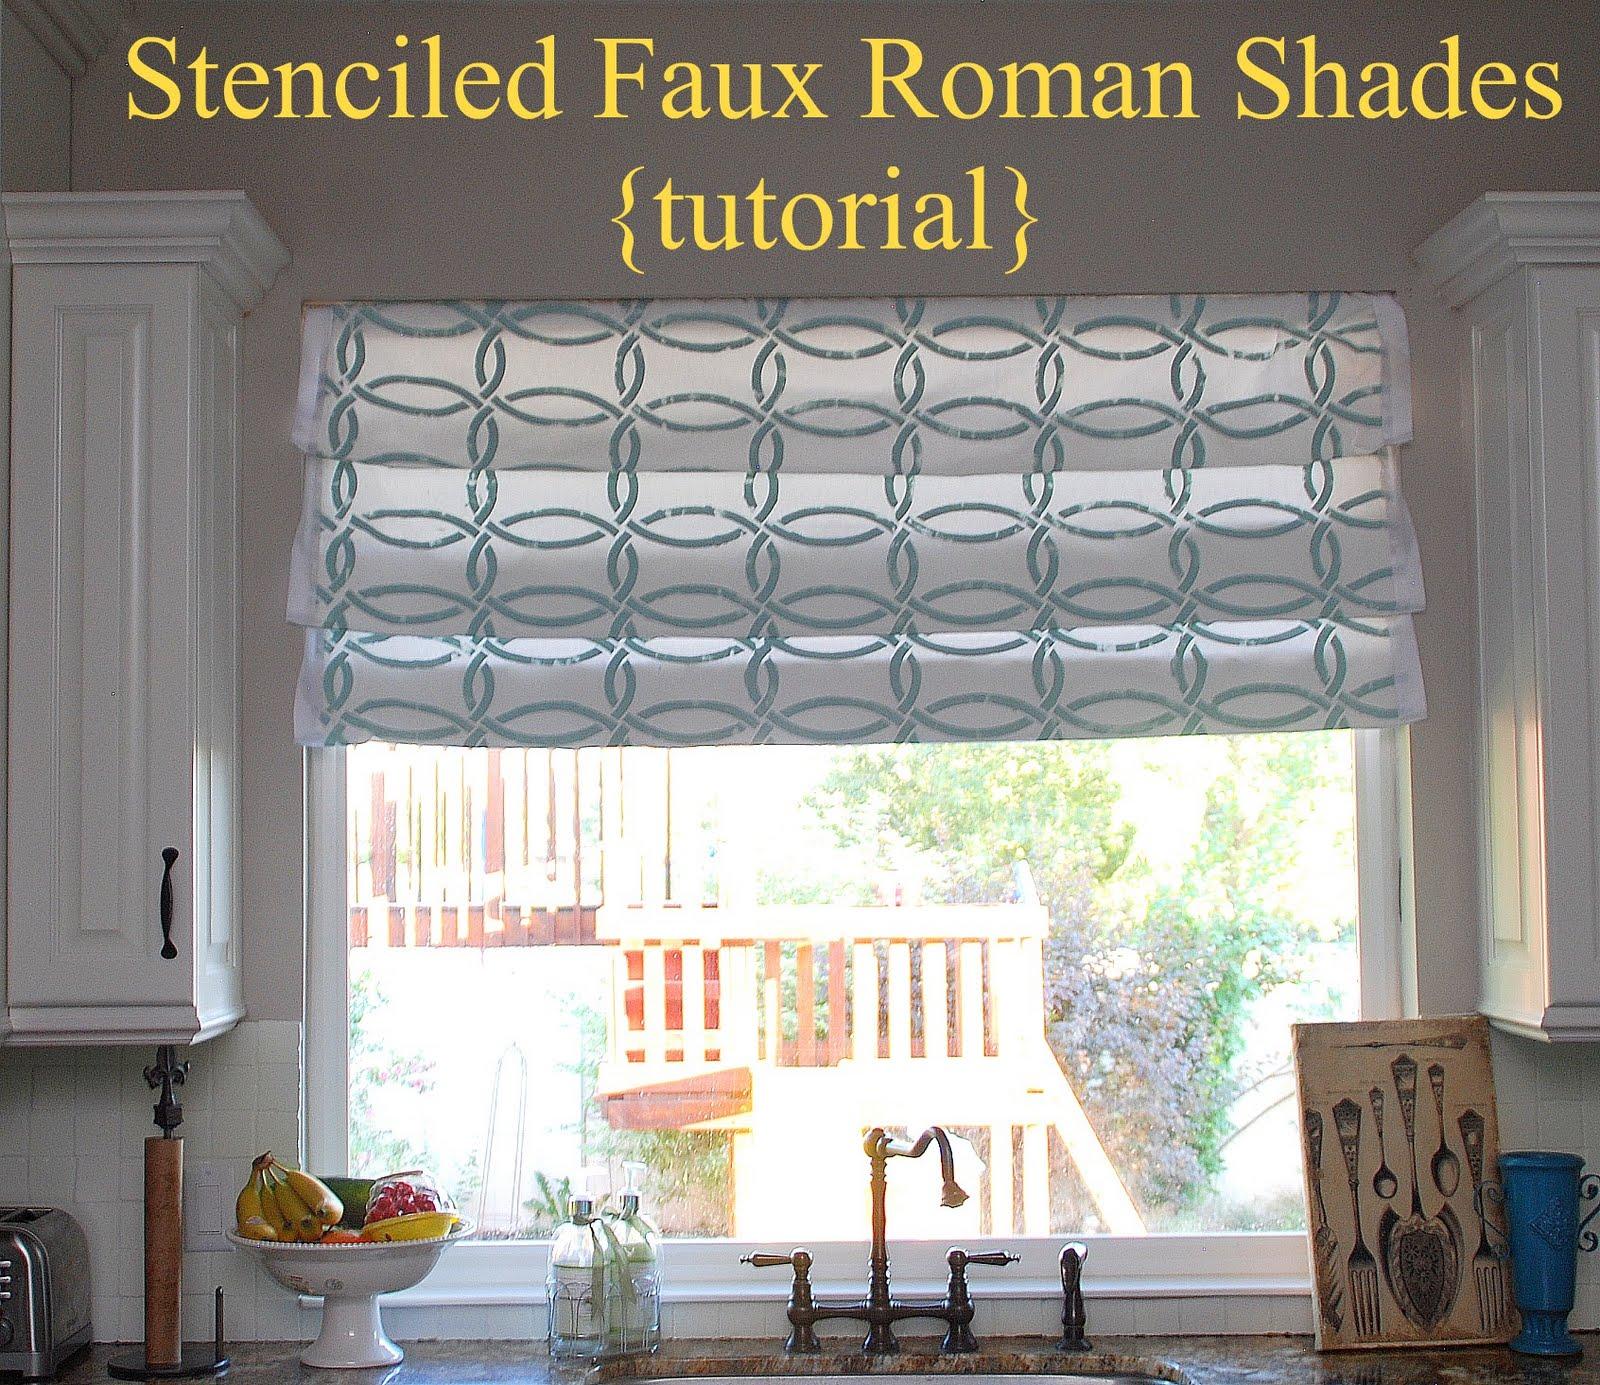 Stenciled Faux Roman Shades Tutorial Kitchen Sneak K